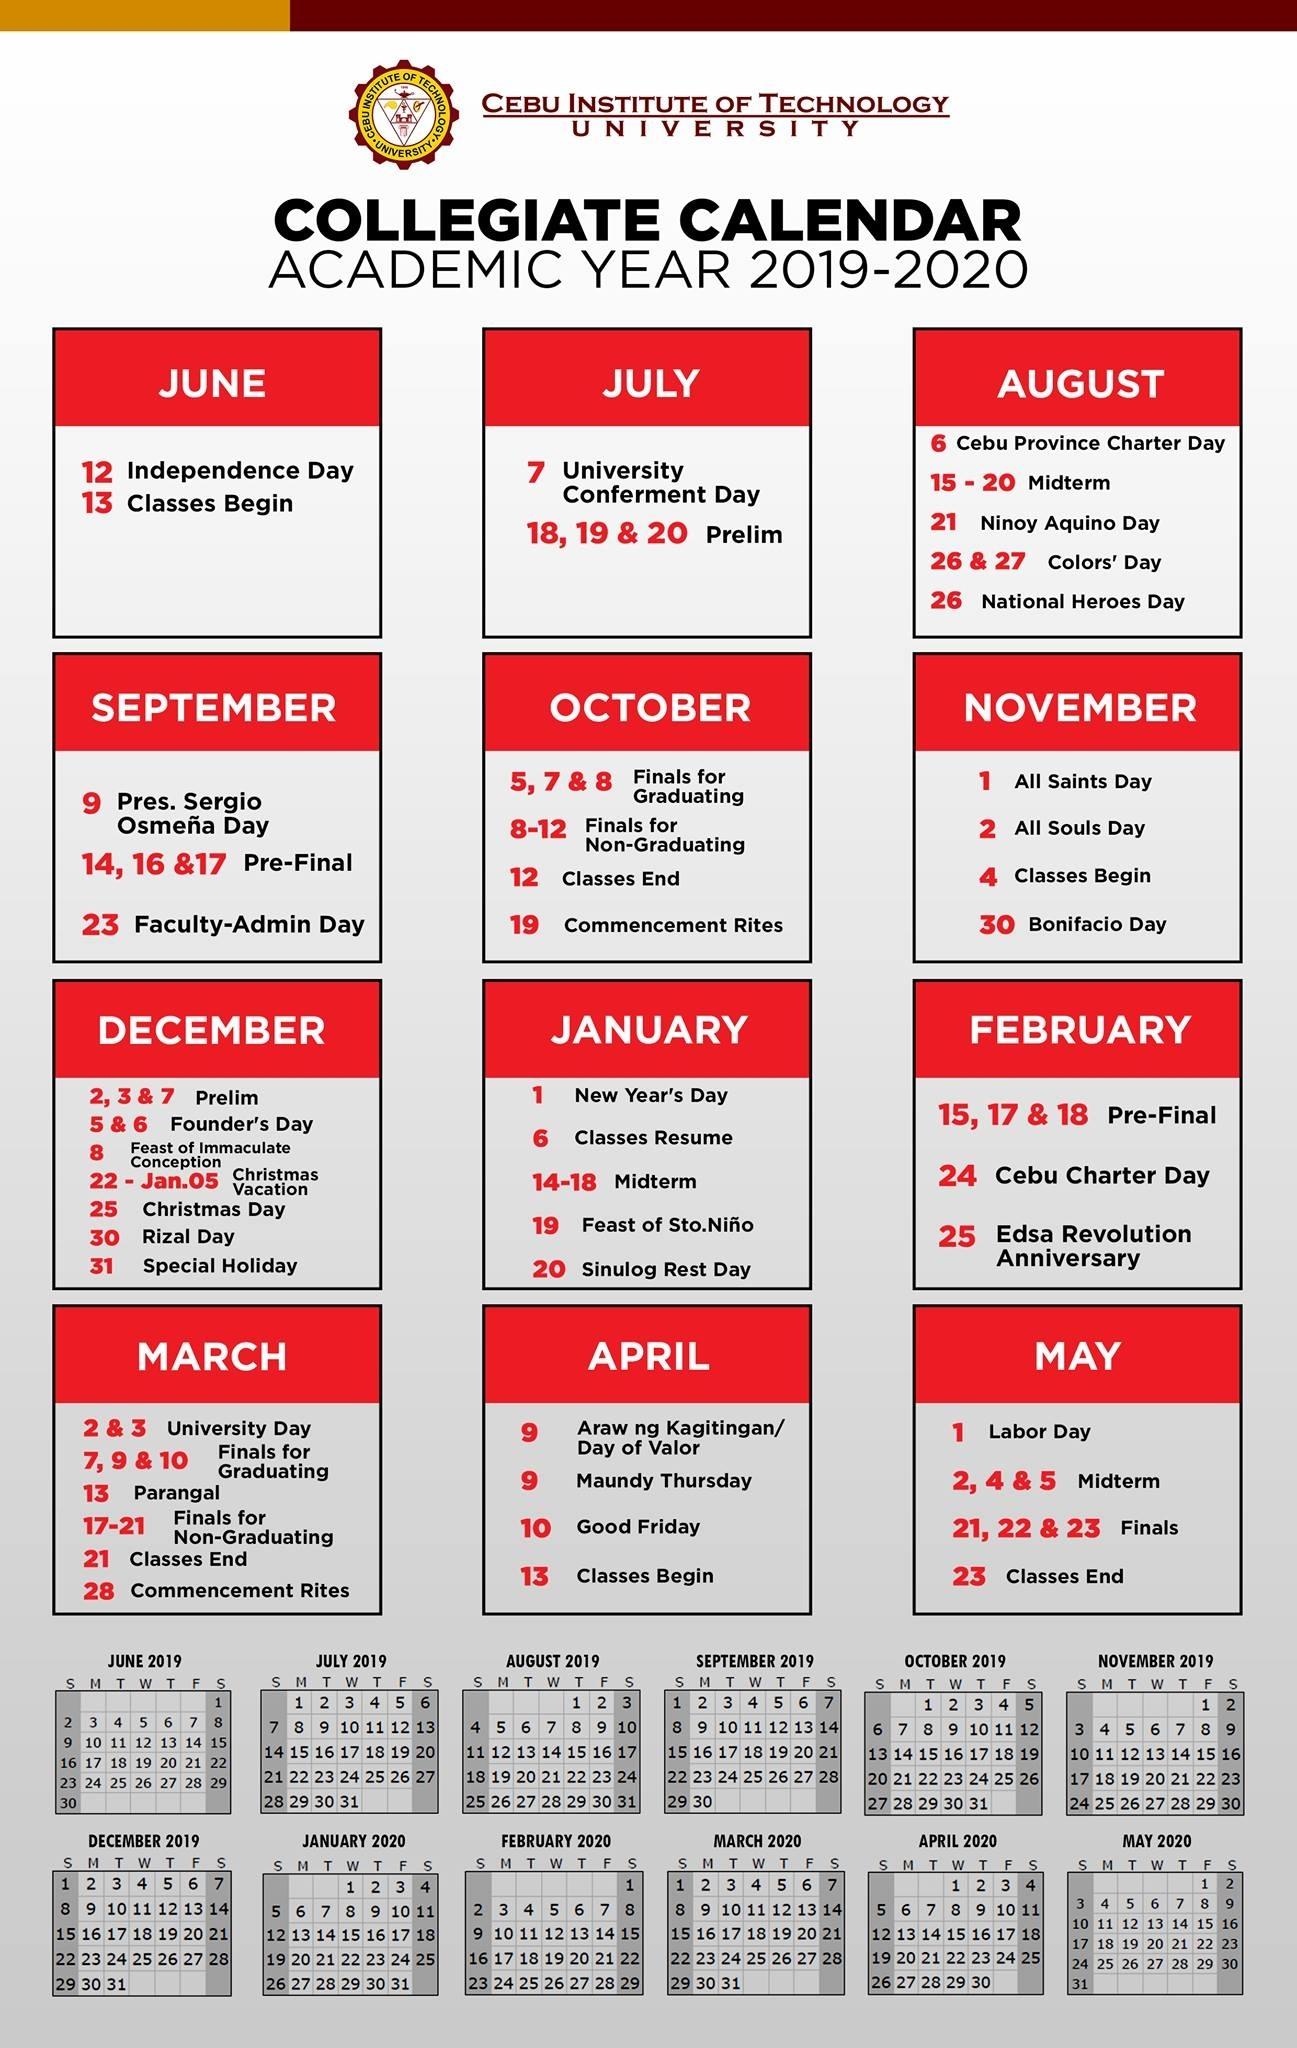 Collegiate Calendar For The Academic Year 2019 – 2020 | Cebu